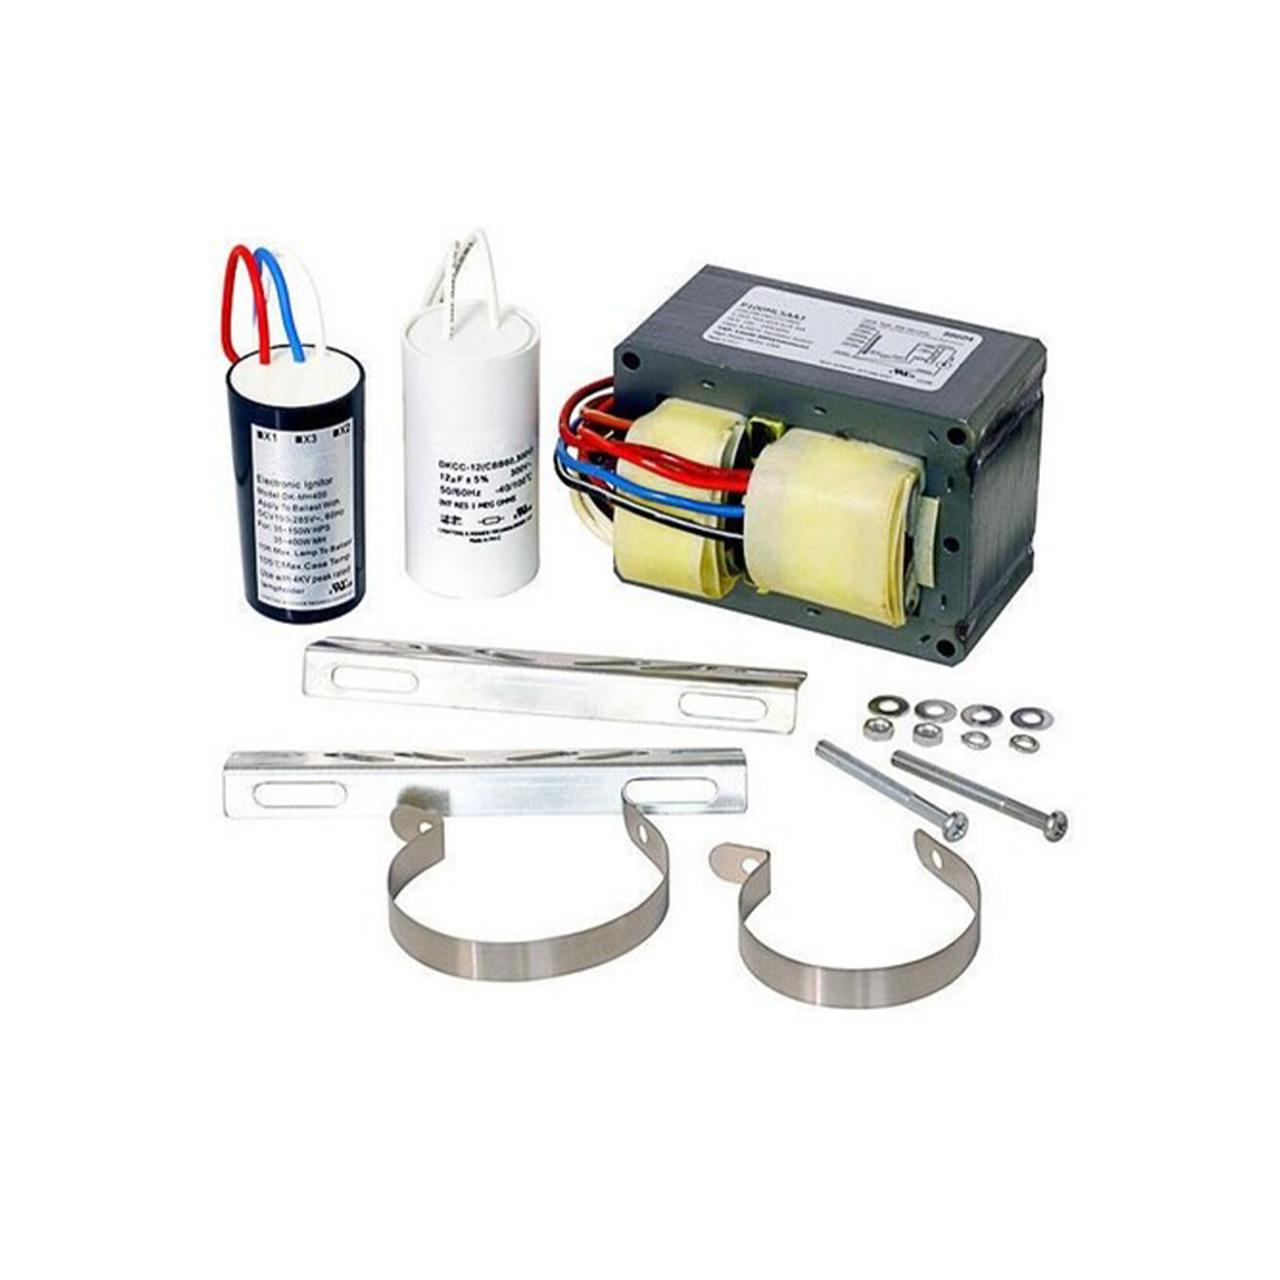 F Howard M0100-71C-512-DK Max ANSI M90 Metal Halide Ballast Power Factor 90 4 Tap 100 Watt Temp Rating 212 Deg Pulse Start Includes Dry Capacitor Ignitor and Bracket Kit